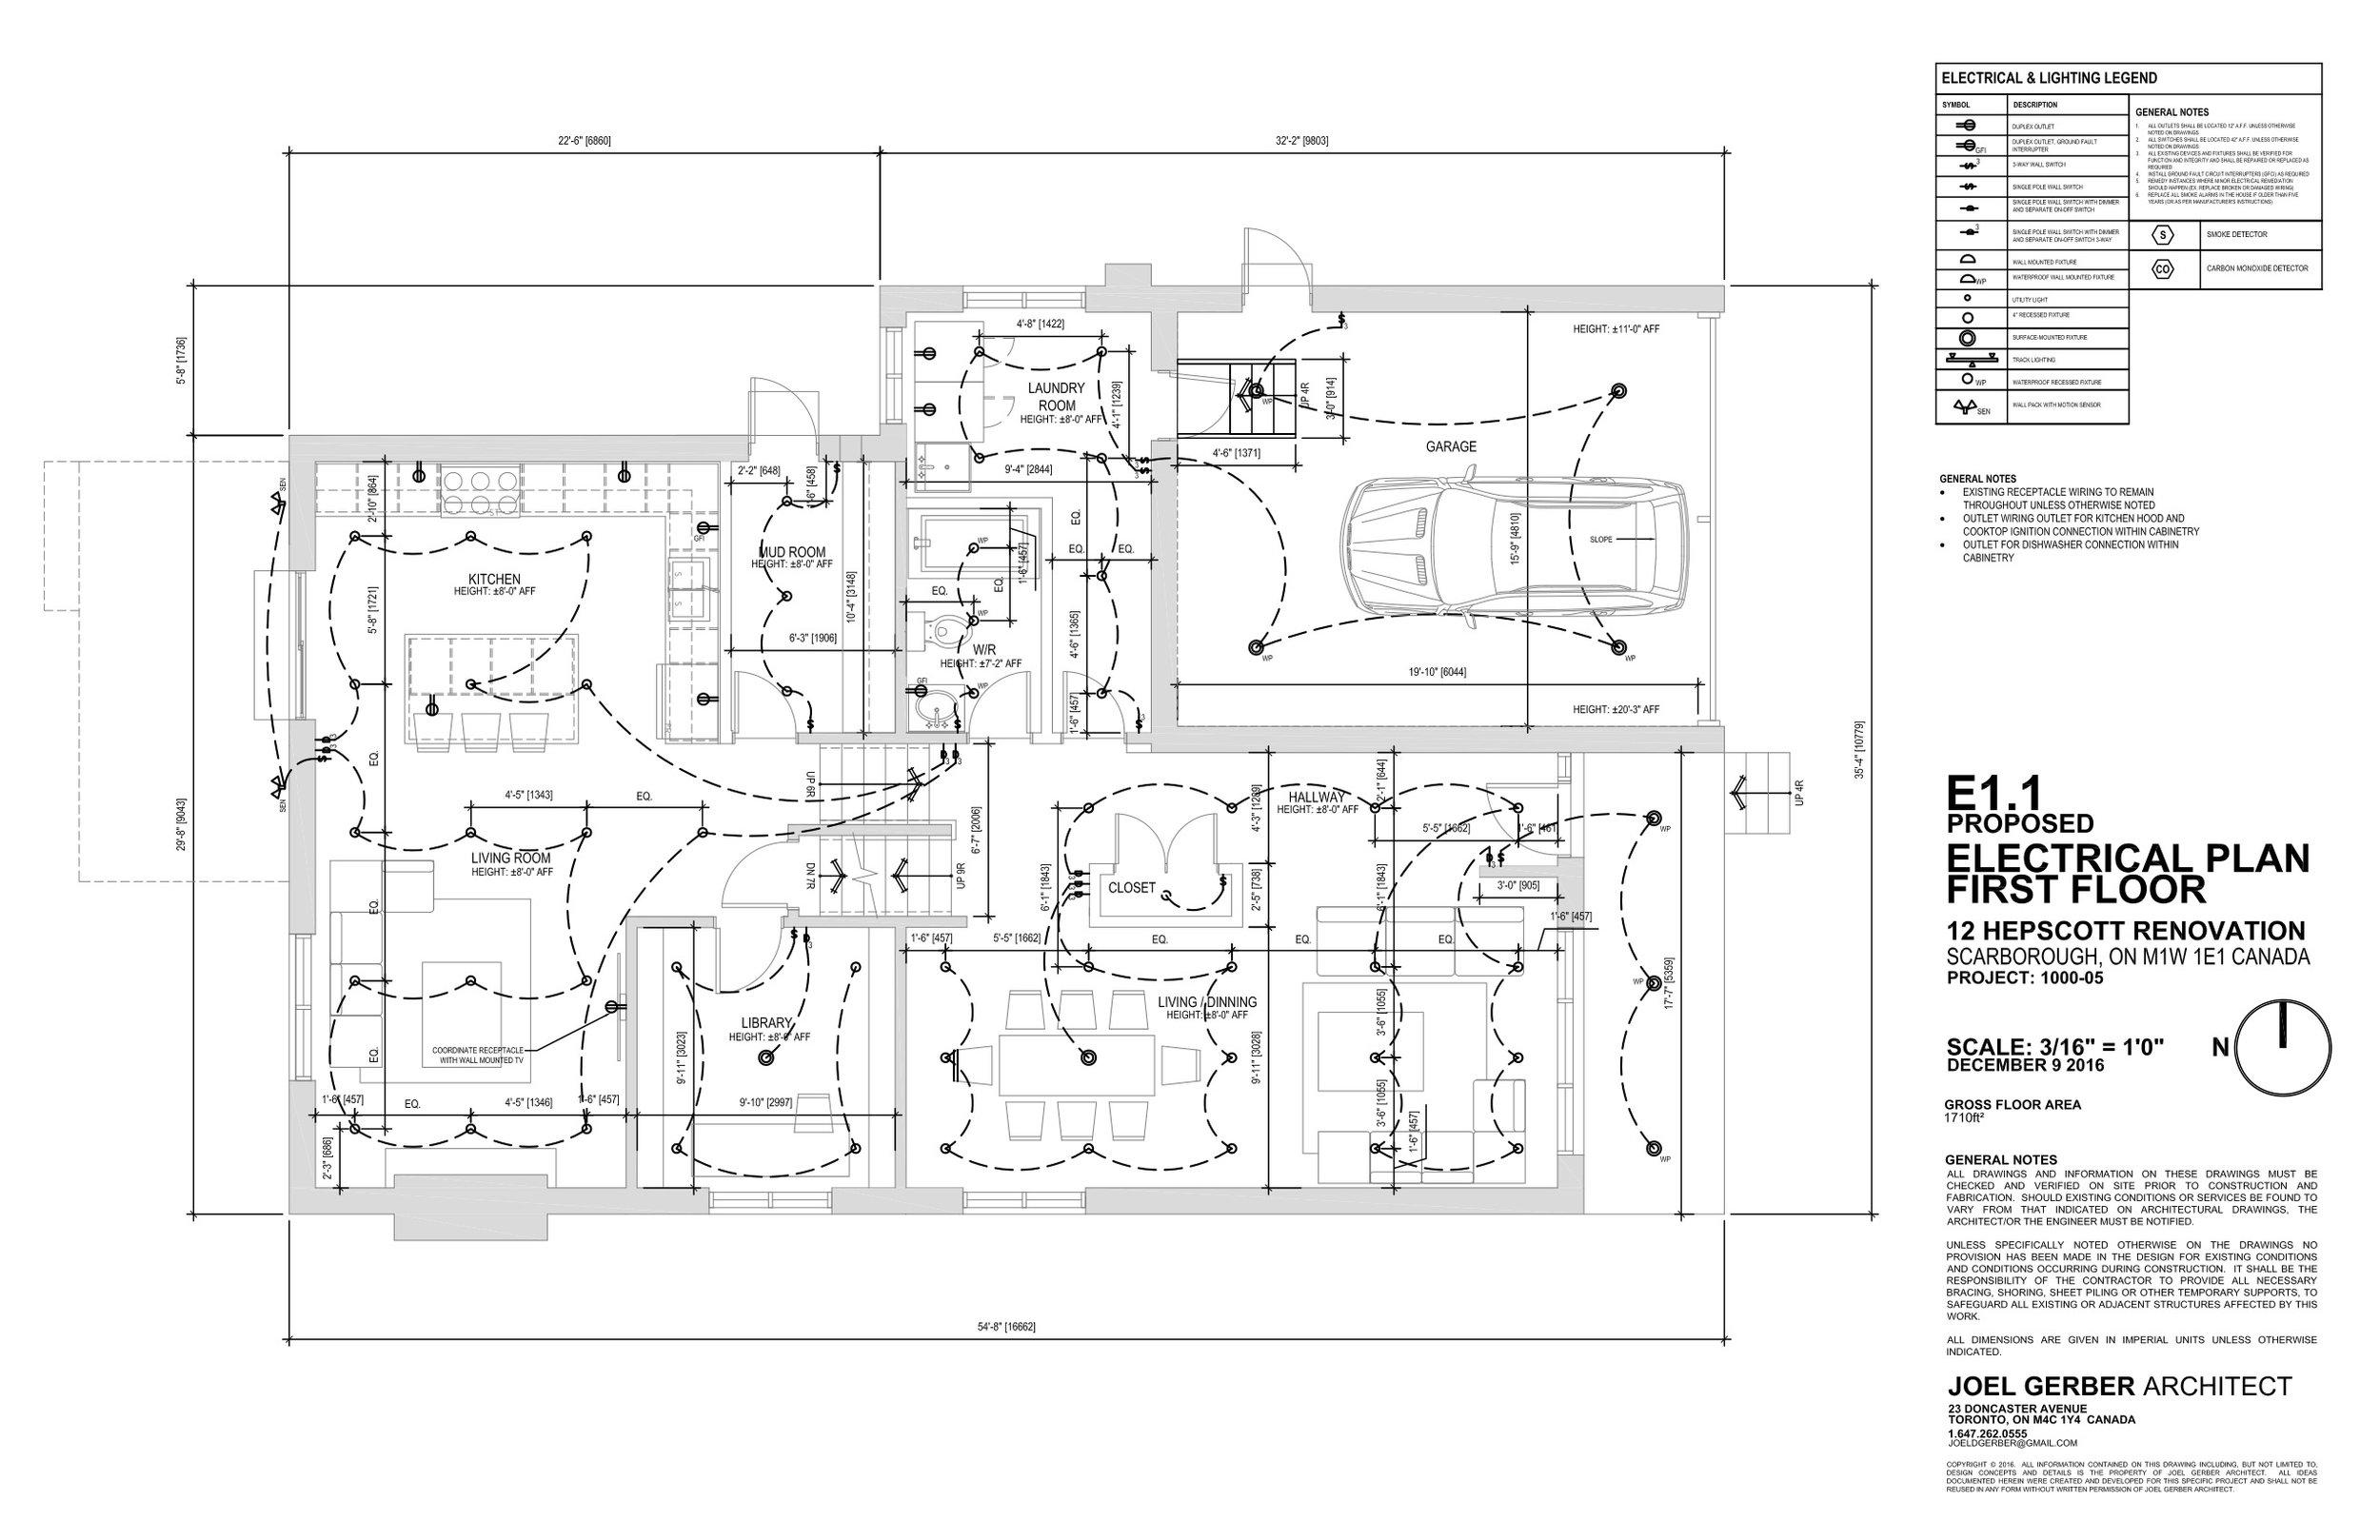 drawing electrical plan [ 2500 x 1618 Pixel ]